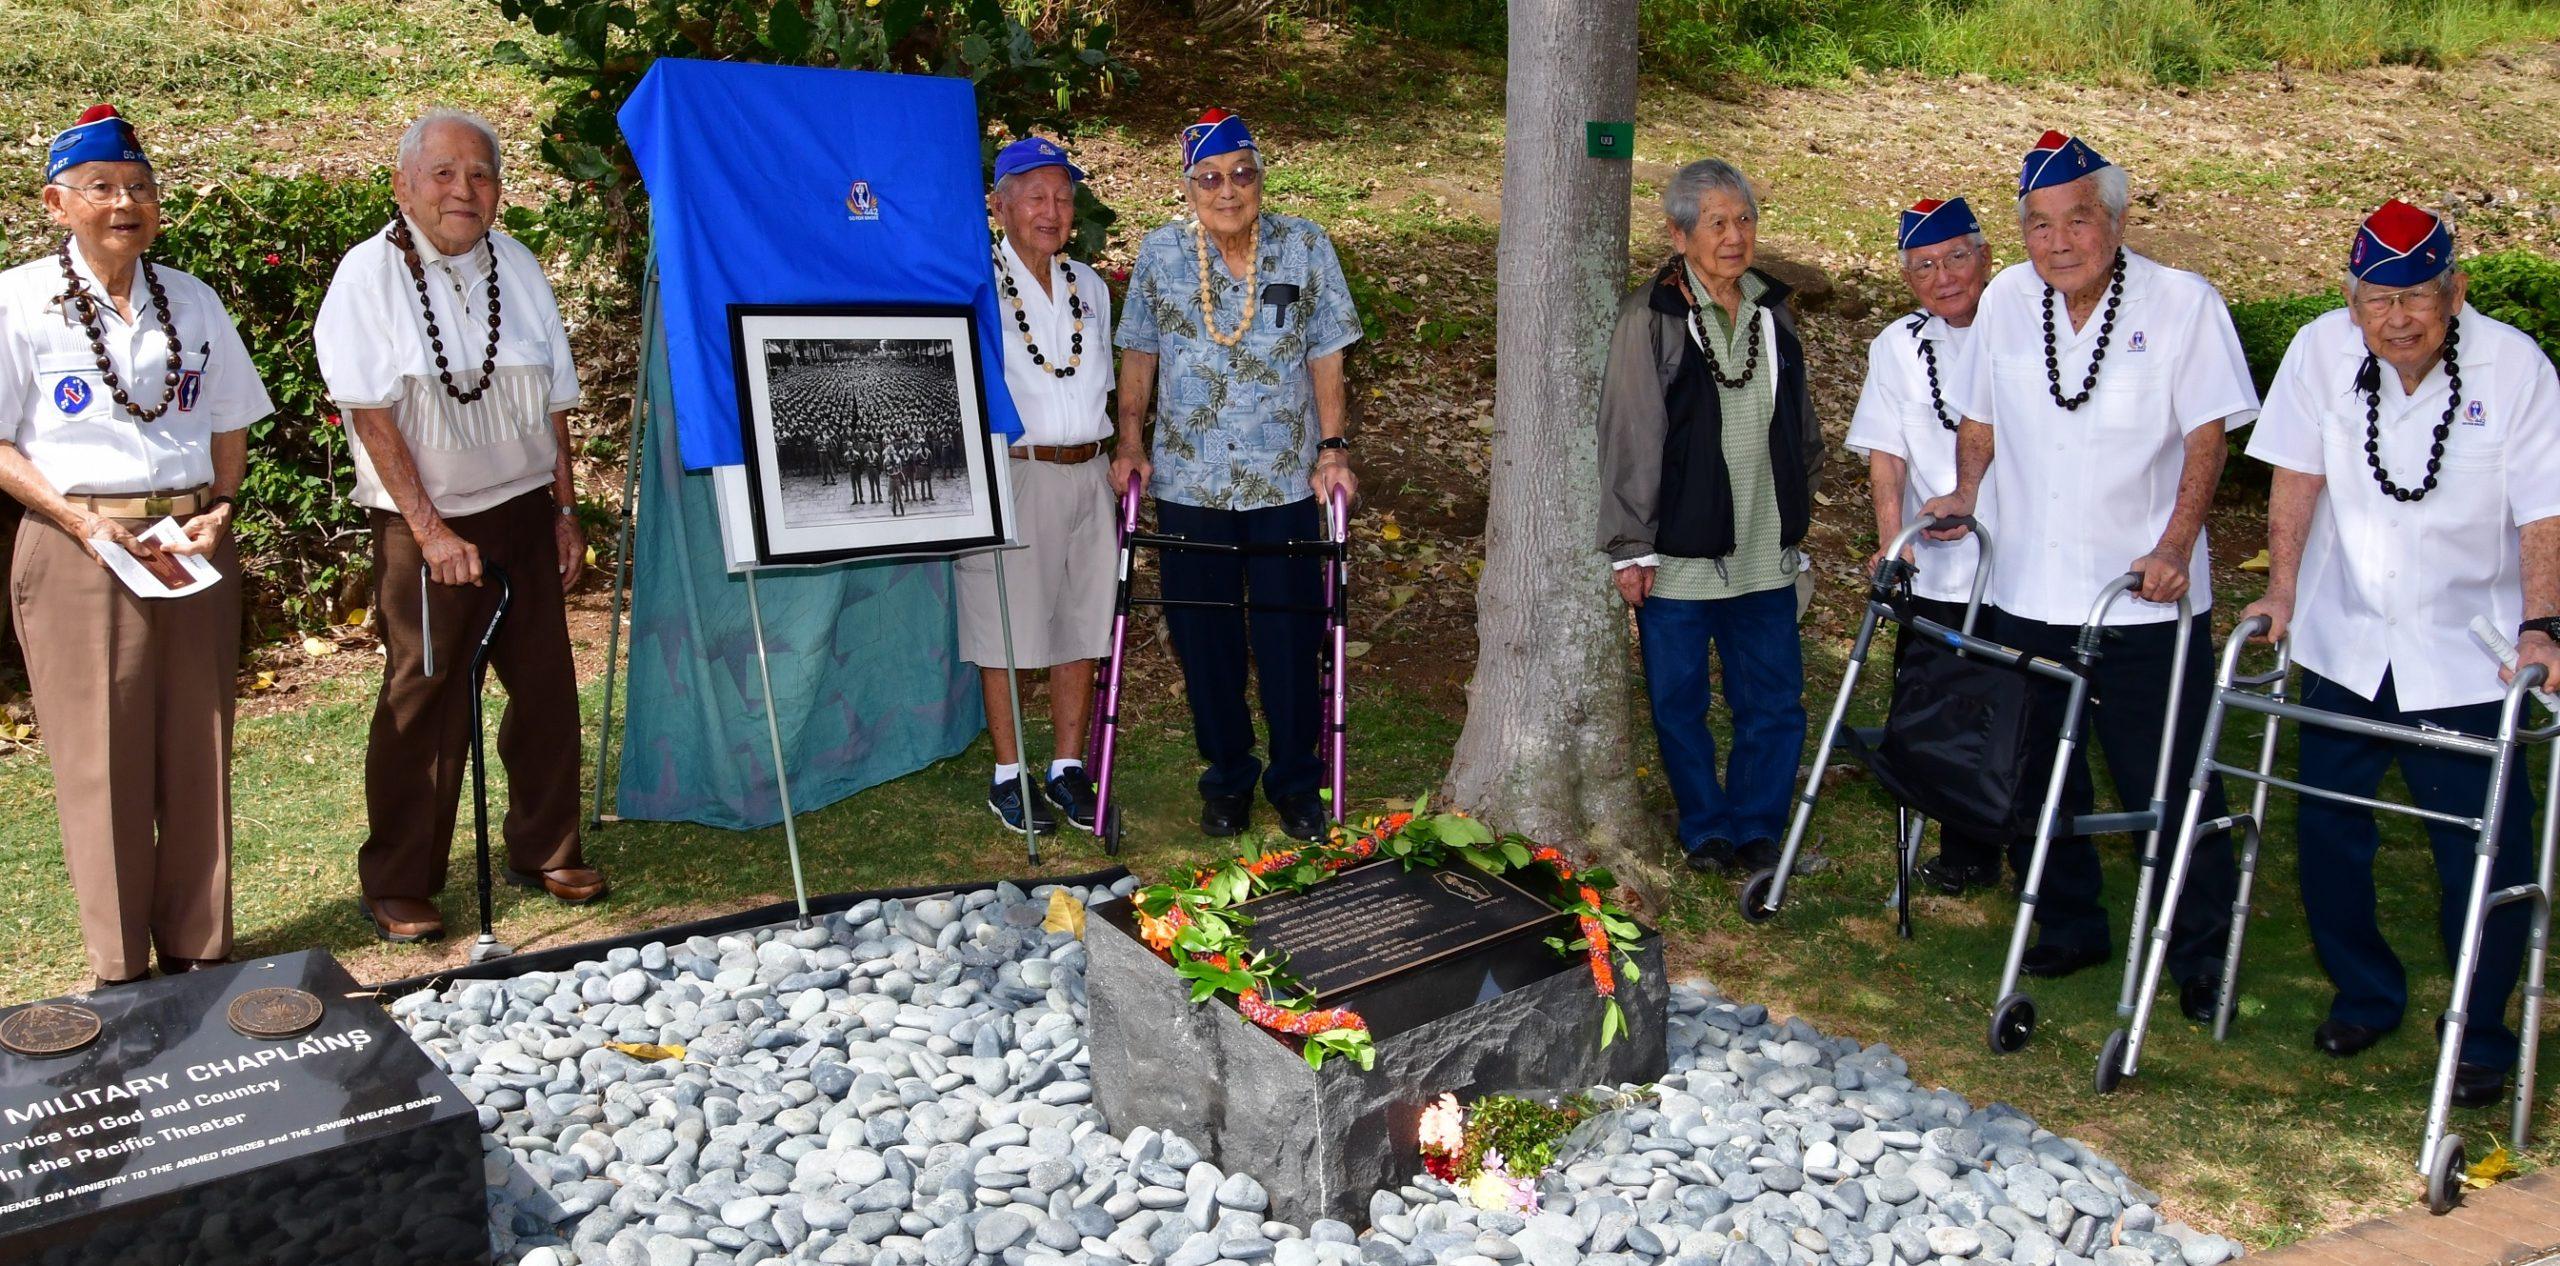 Image of 8 veterans at new memorial monument at Punchbowl